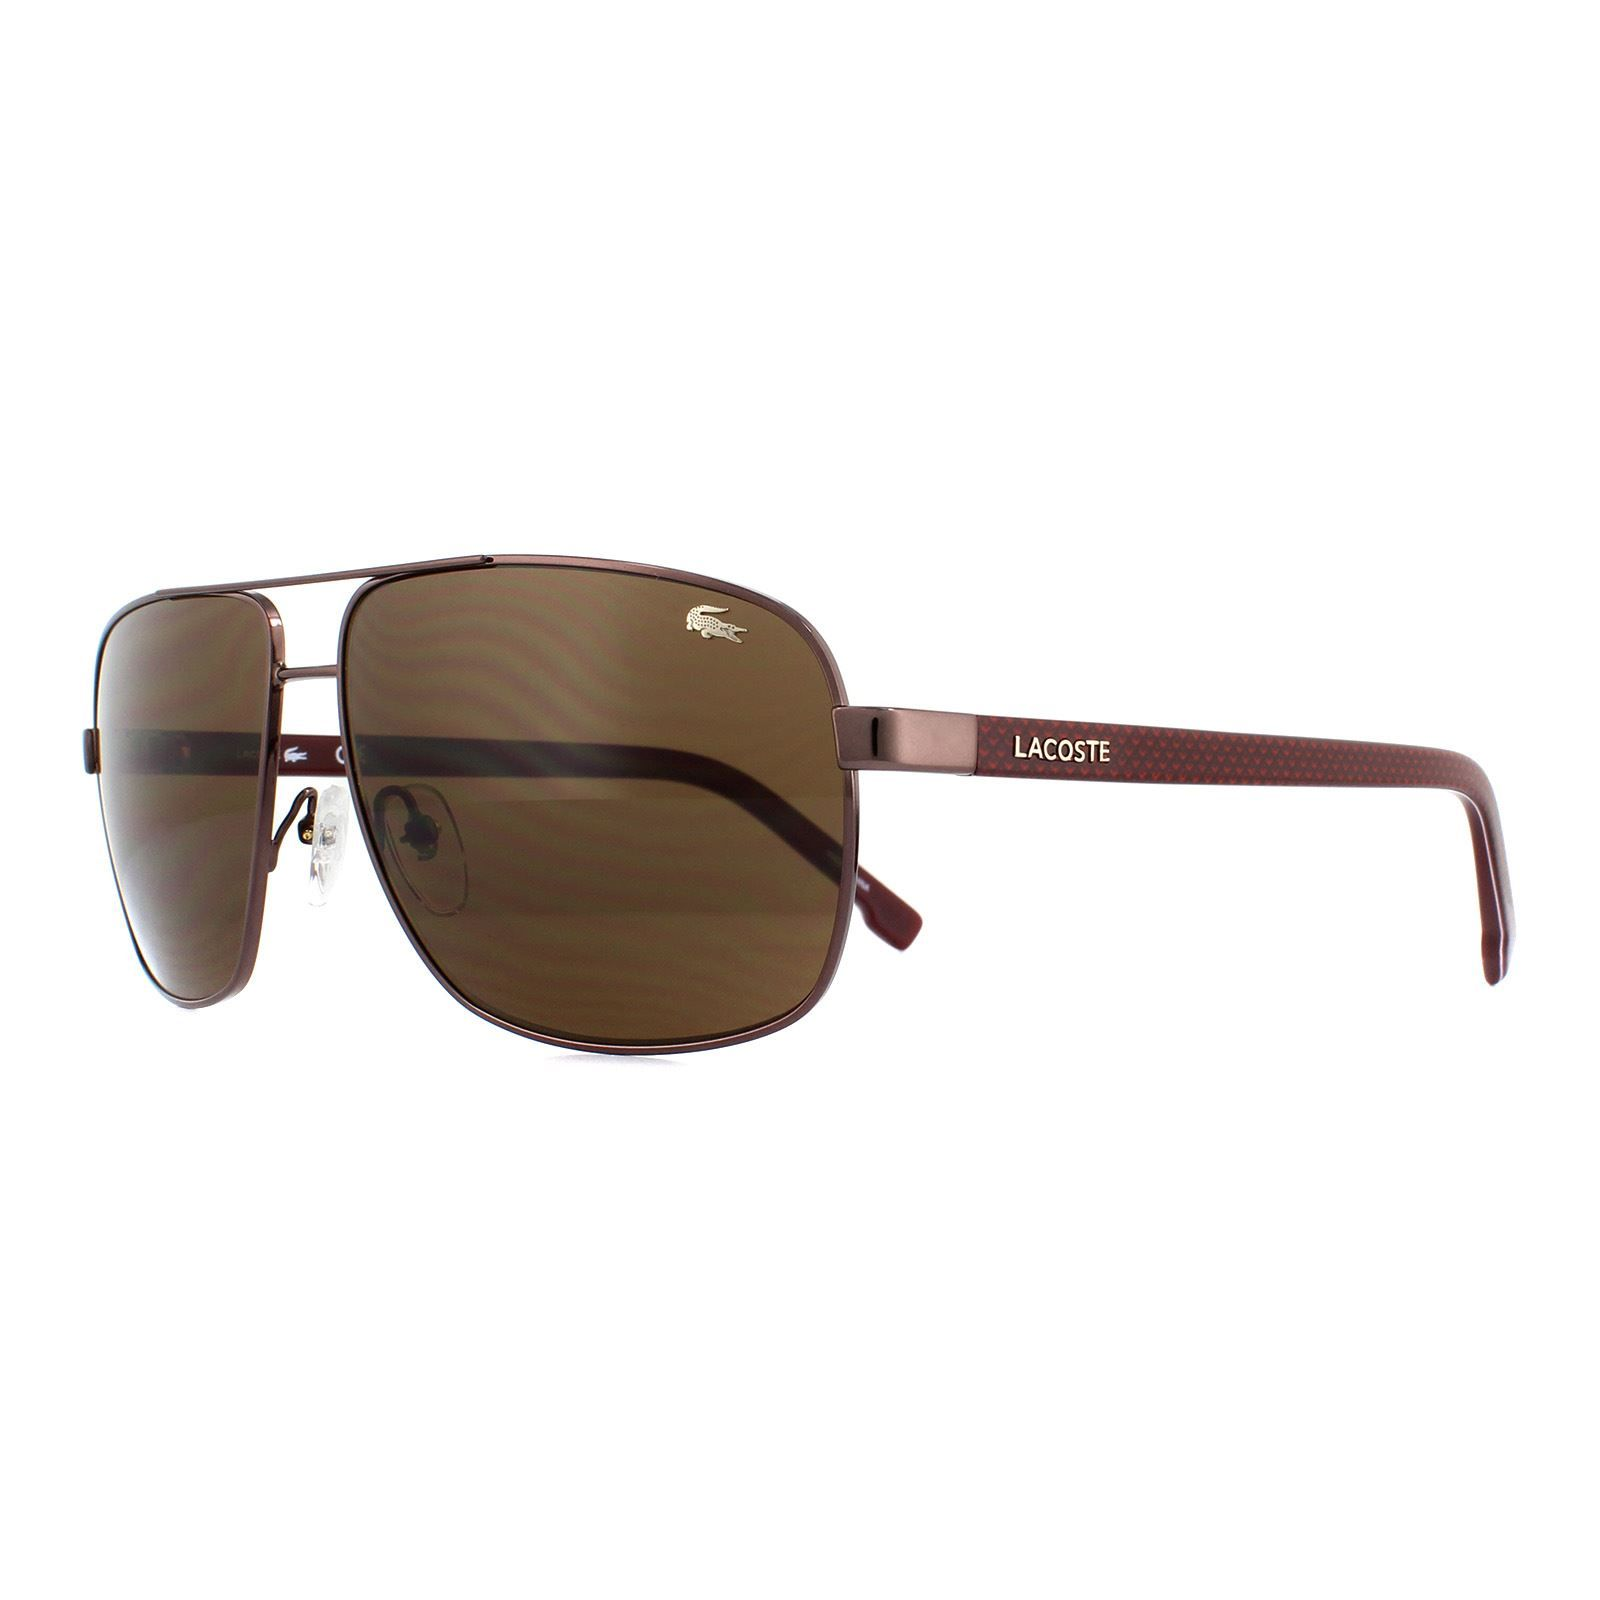 Lacoste Sunglasses L162S 210 Brown Brown Gradient